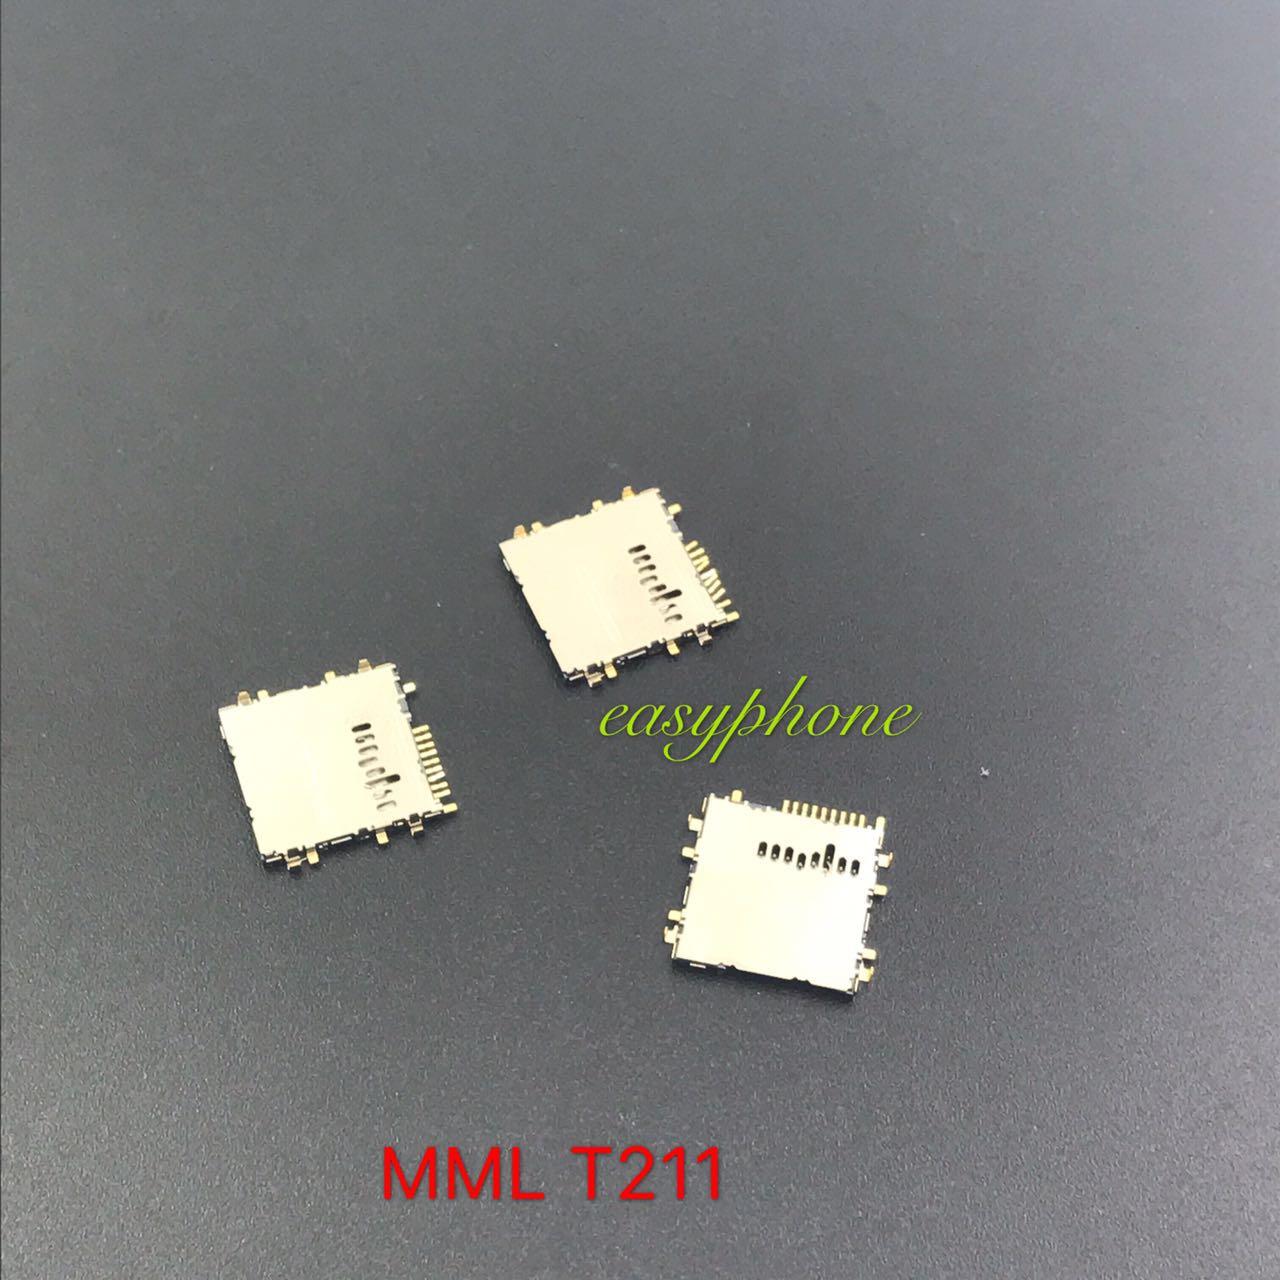 MML T211